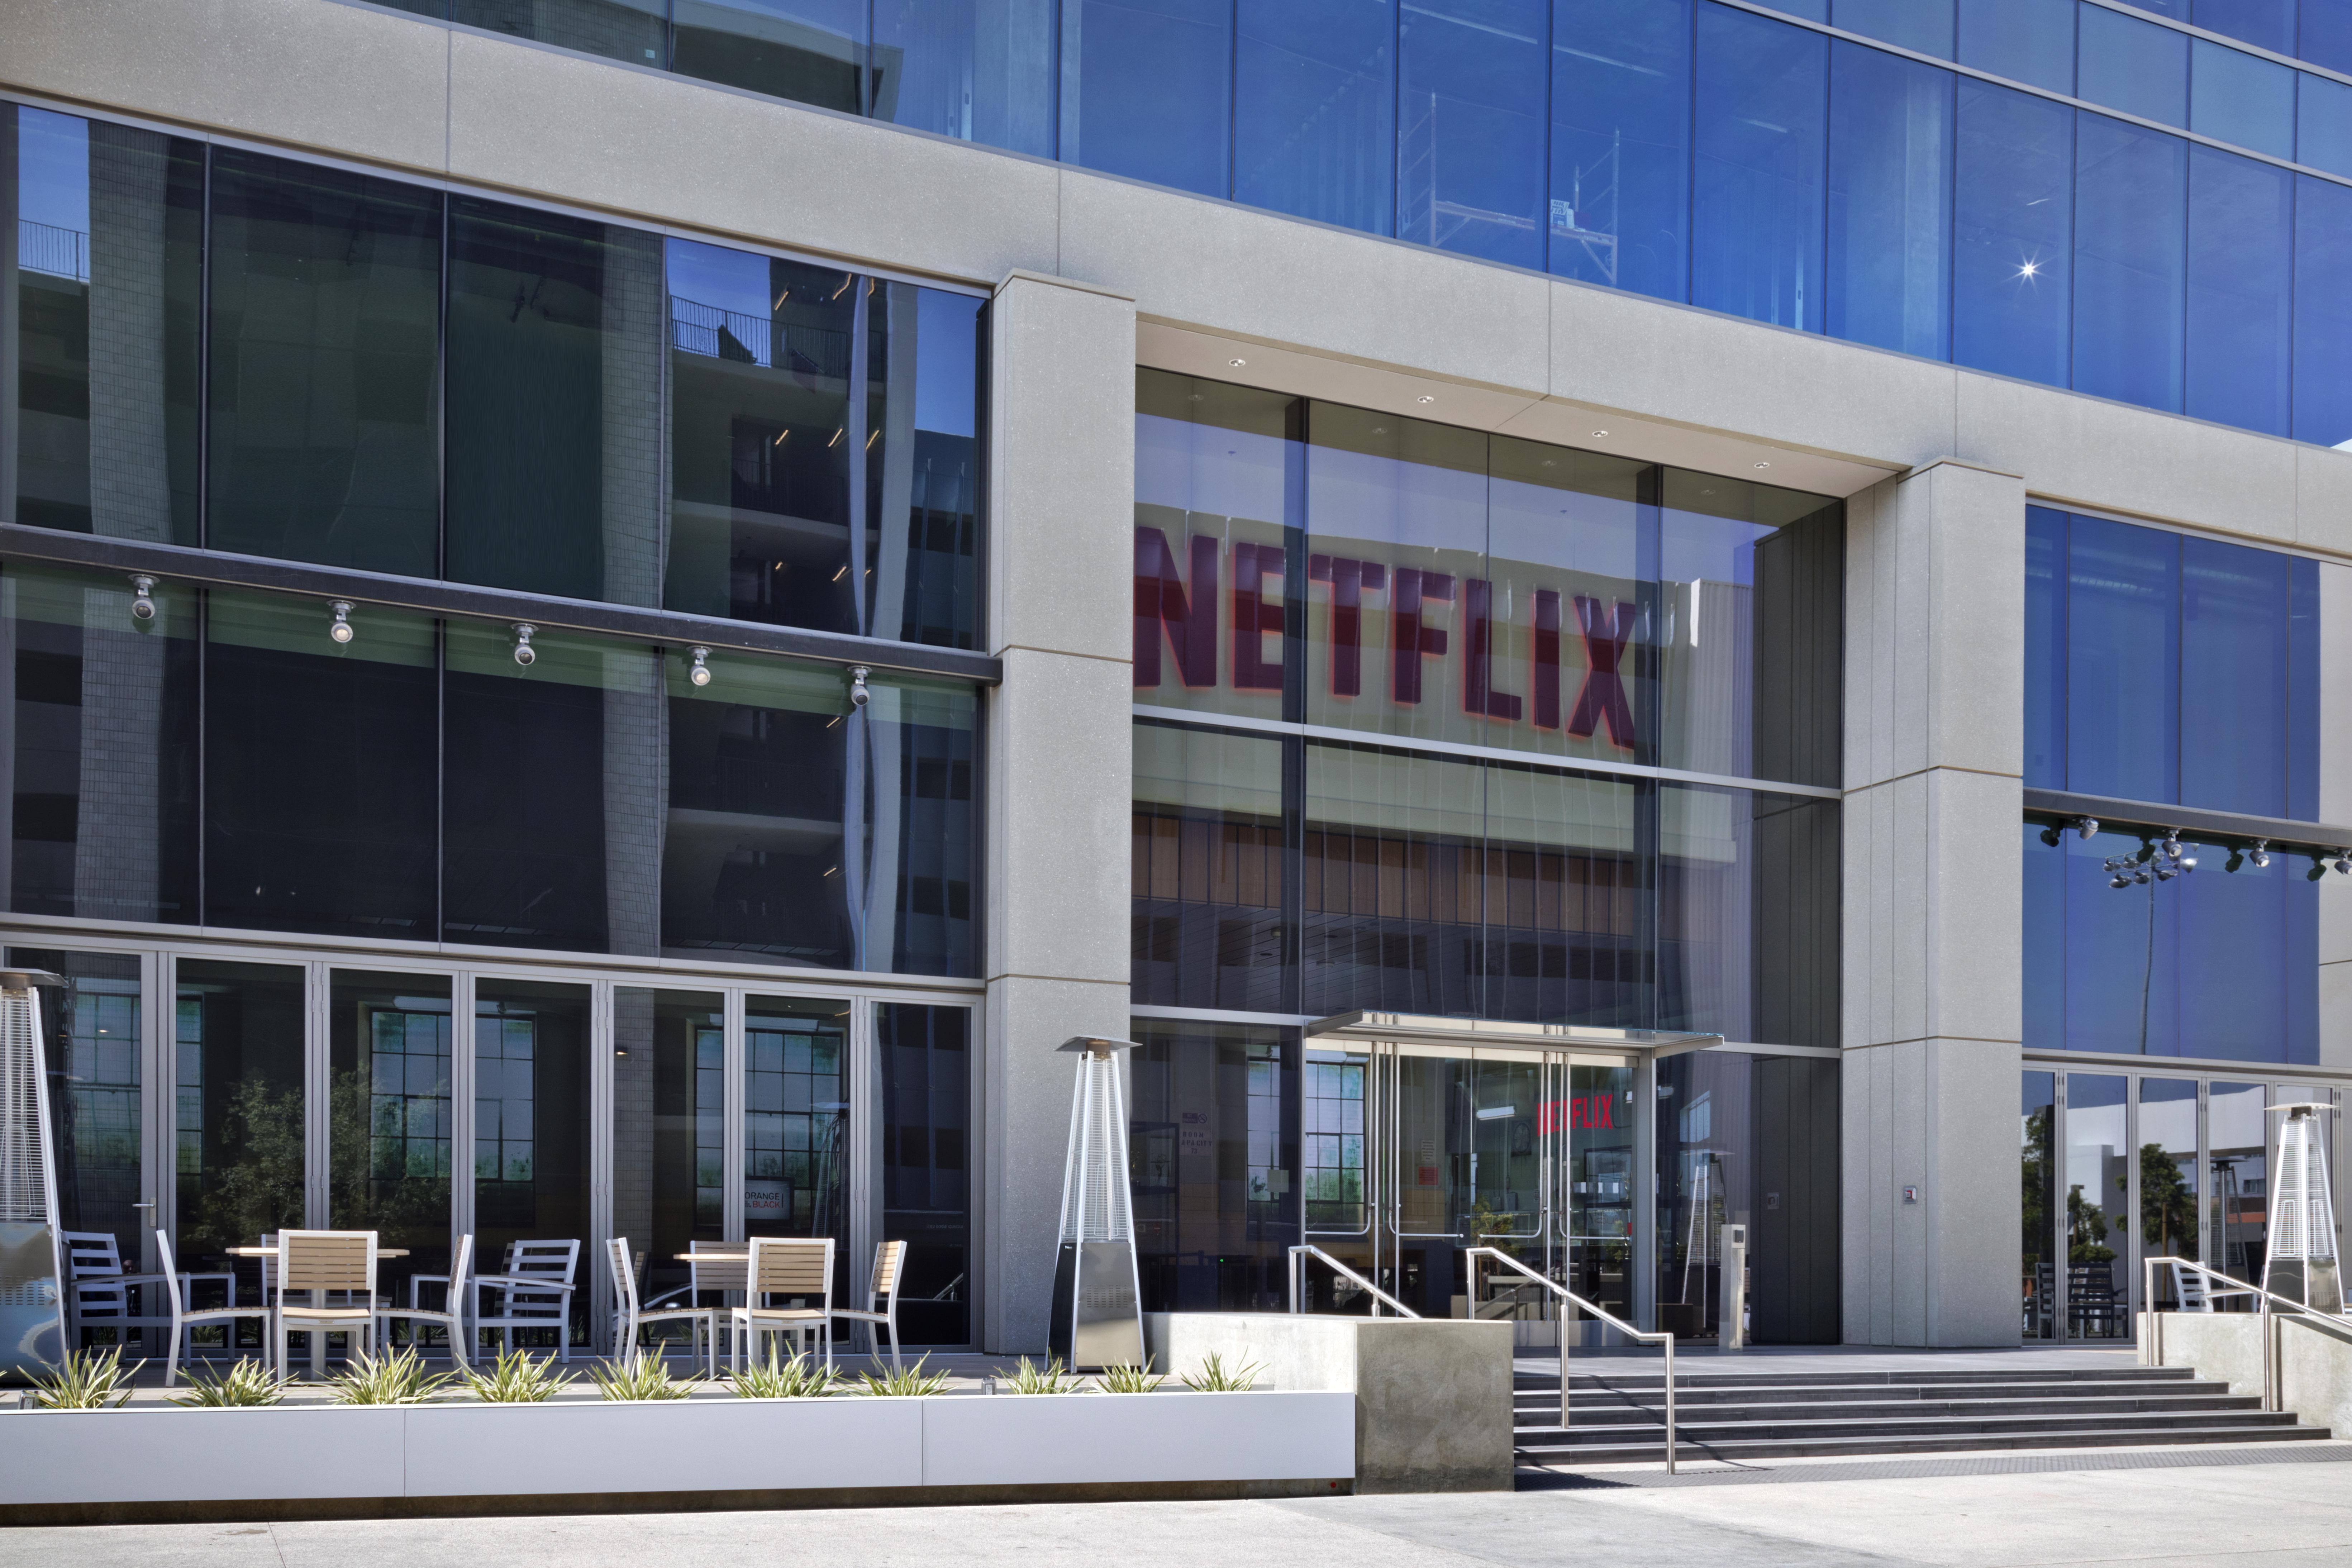 Exterior of Netflix's headquarters in Los Angeles